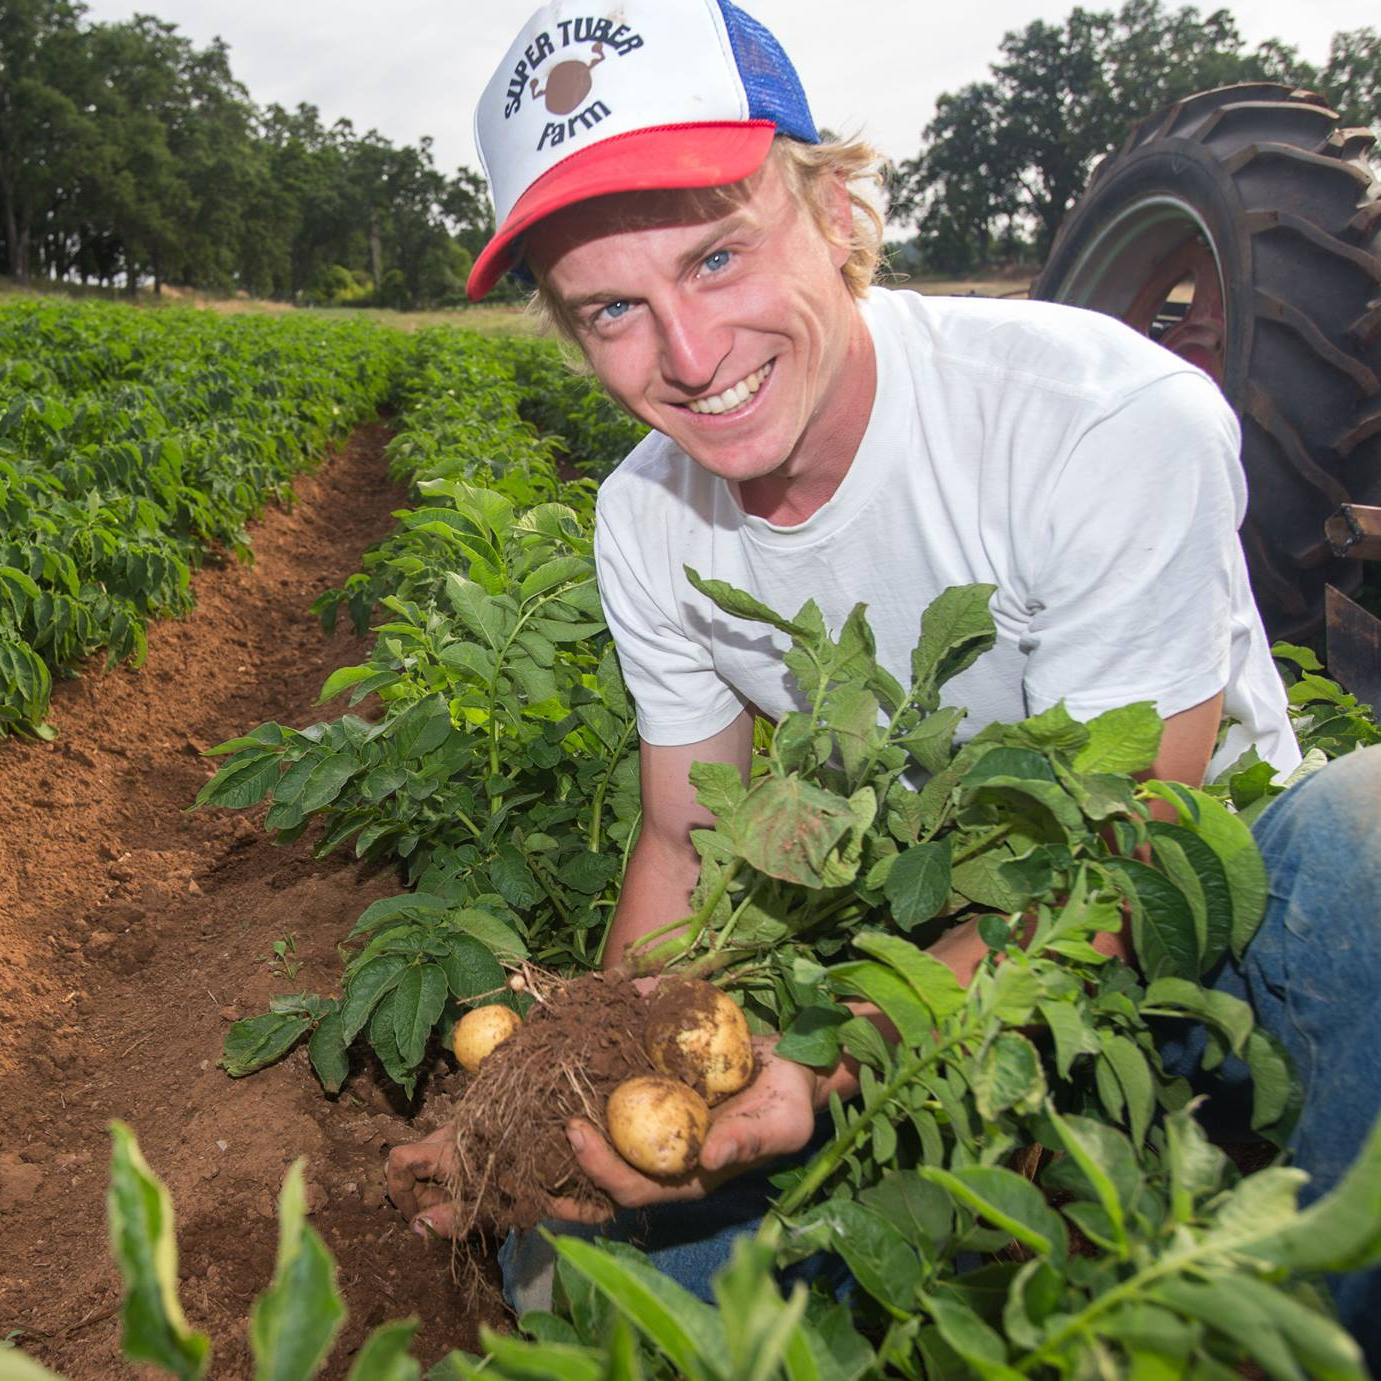 Super Tuber Farm - Certified Organic CCOF